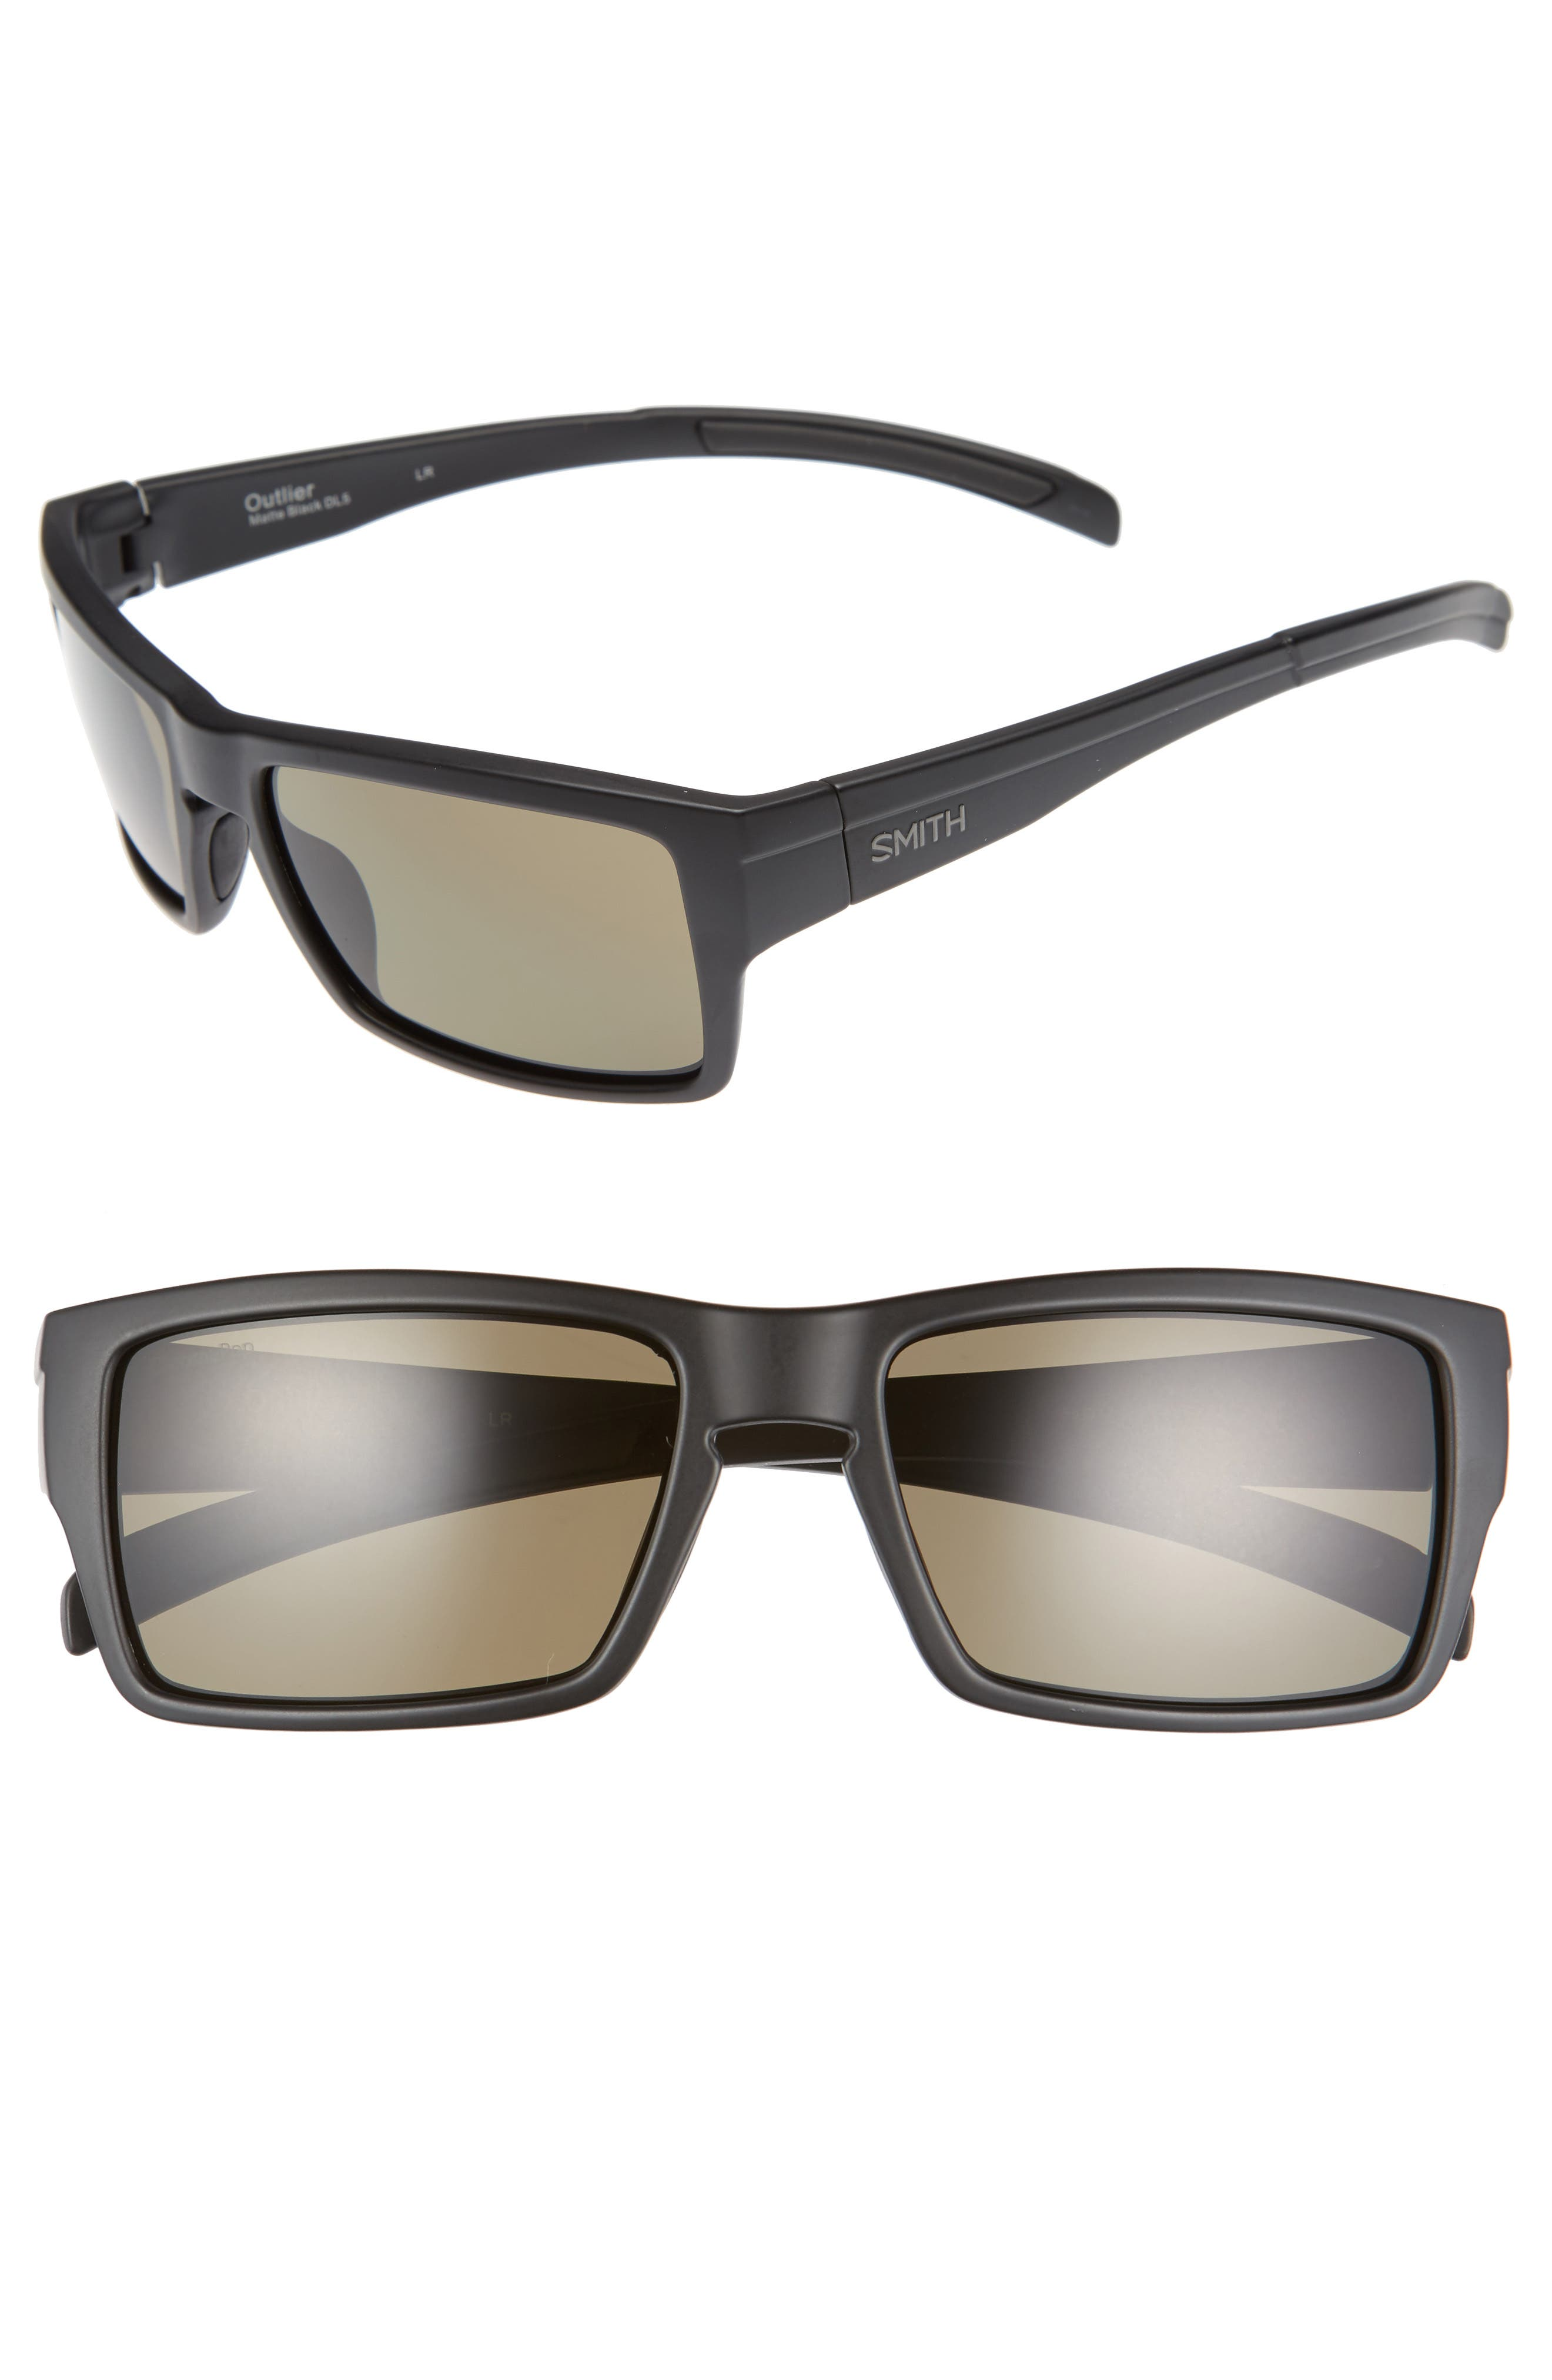 Main Image - Smith Outlier 56mm ChromaPop Polarized Sunglasses